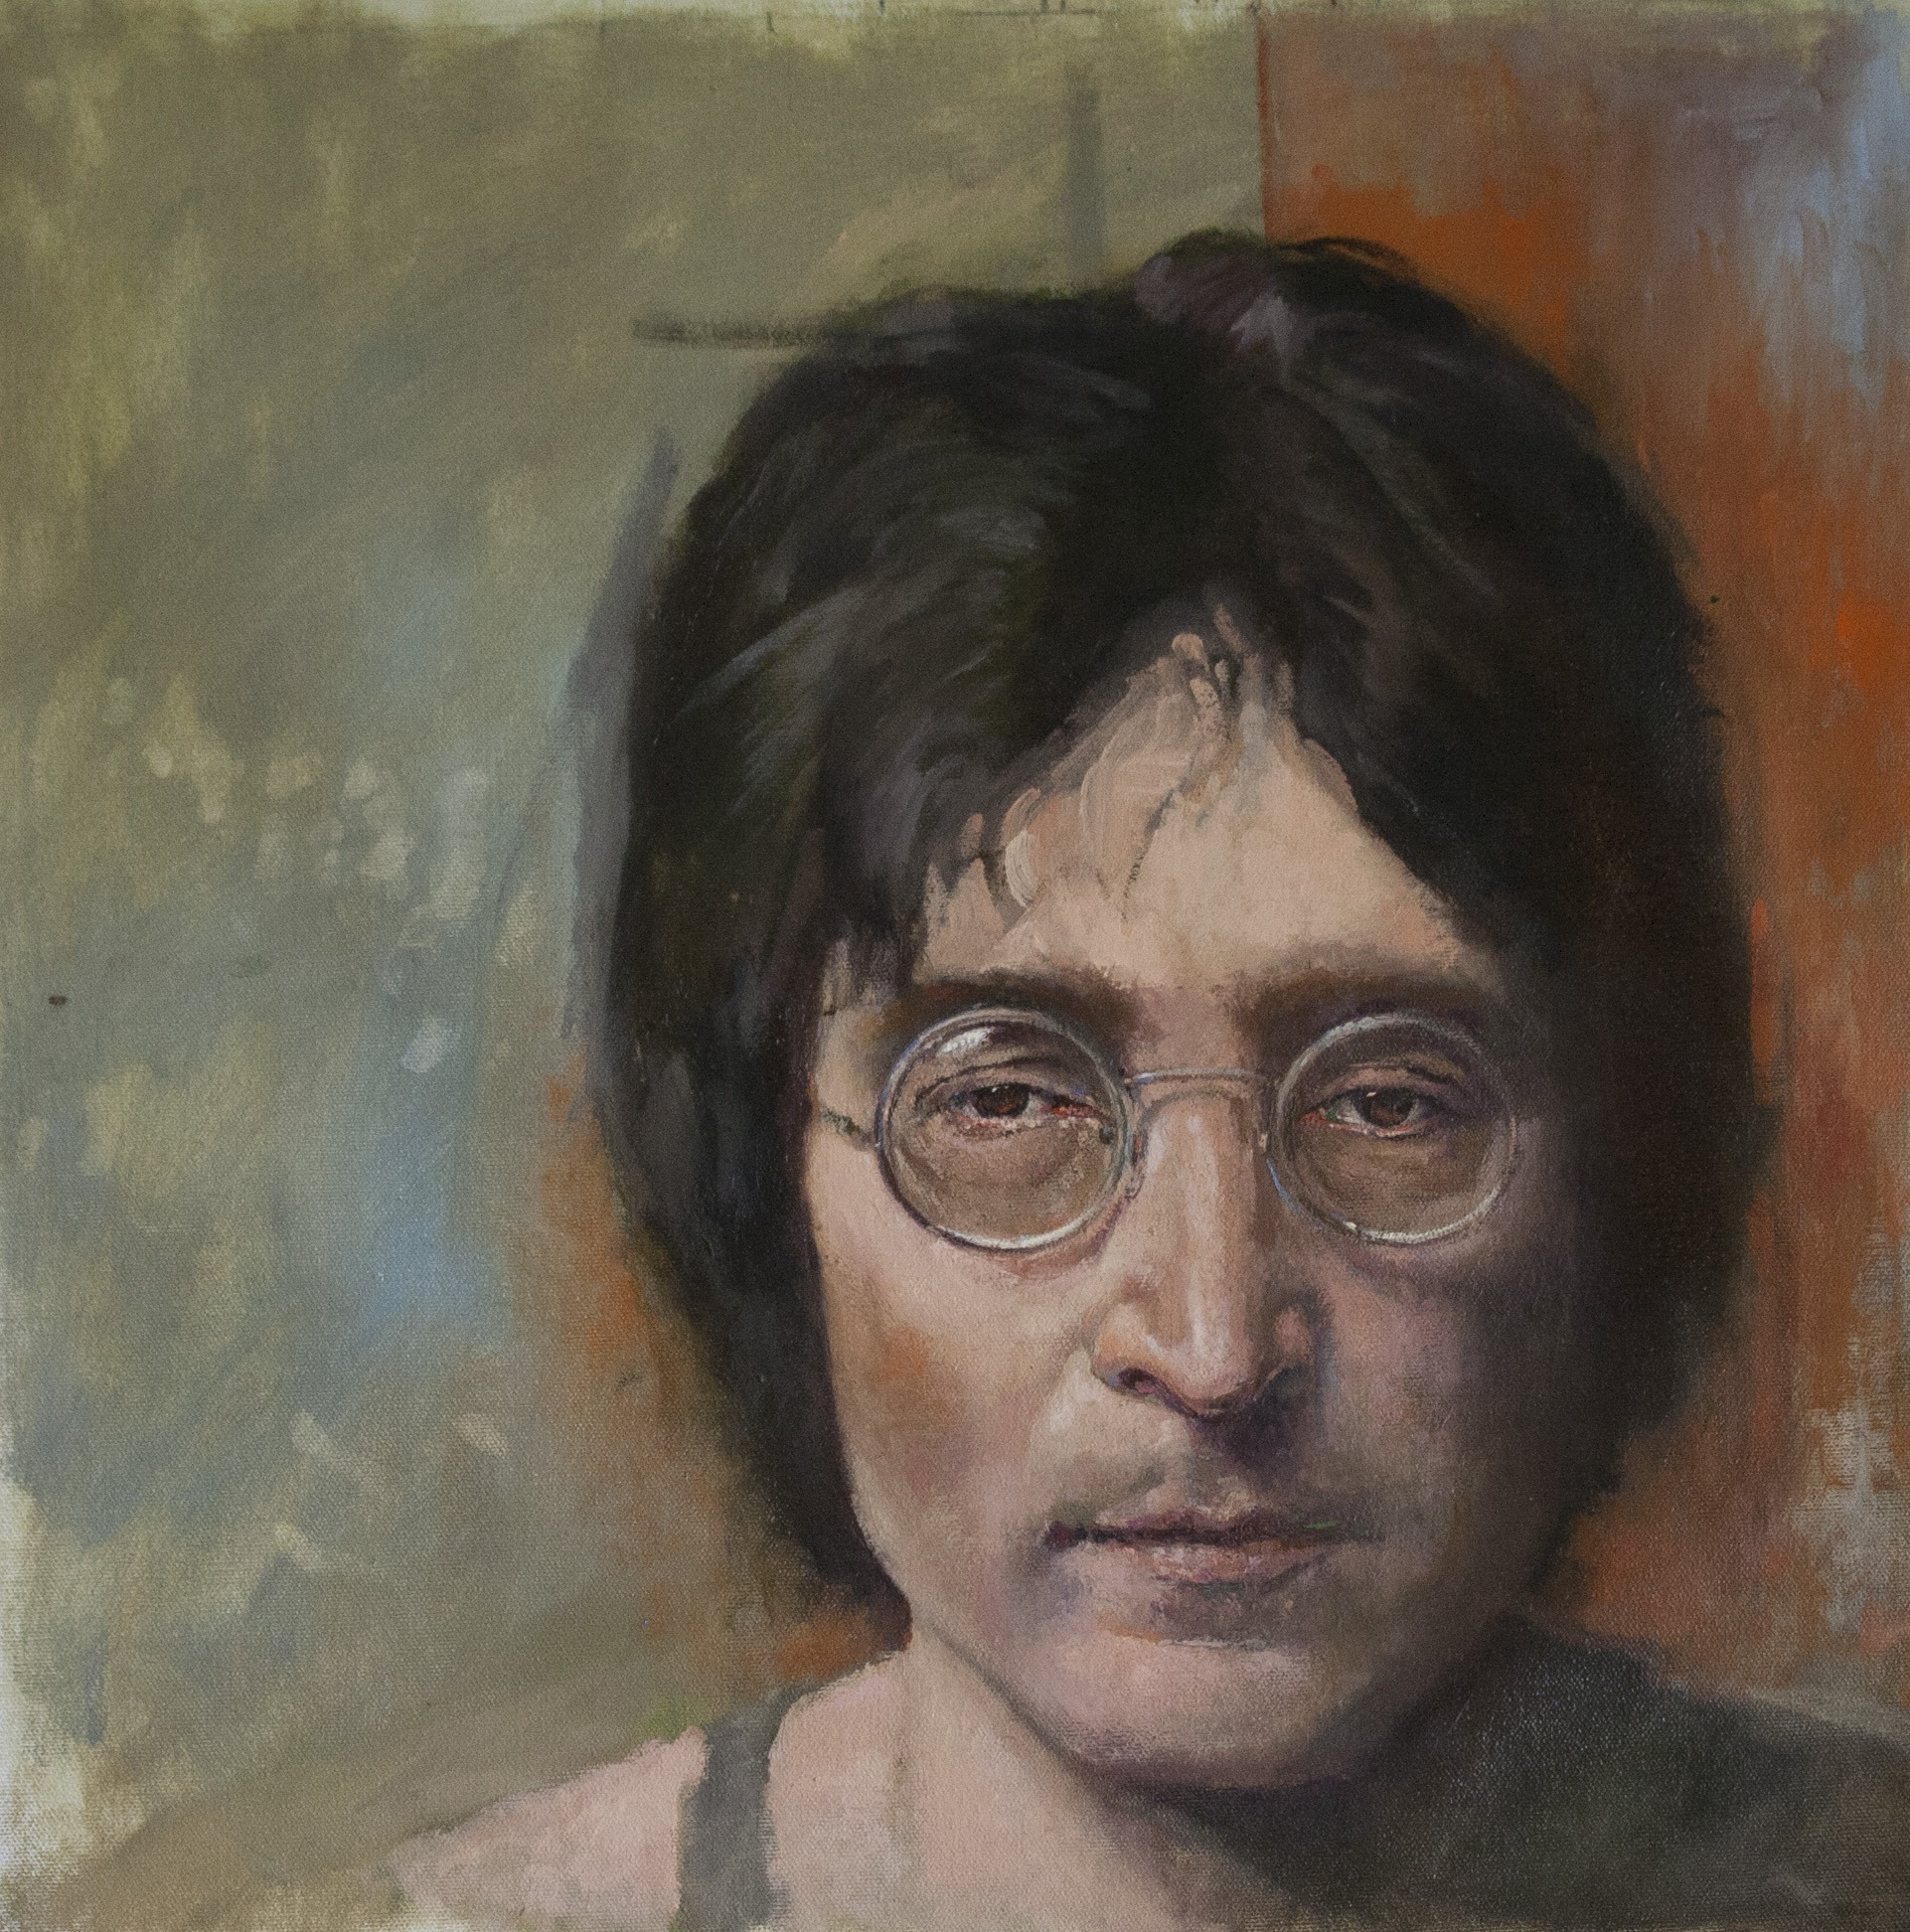 Lennon - David Zeggert, Faculty, SUNY Broome CC